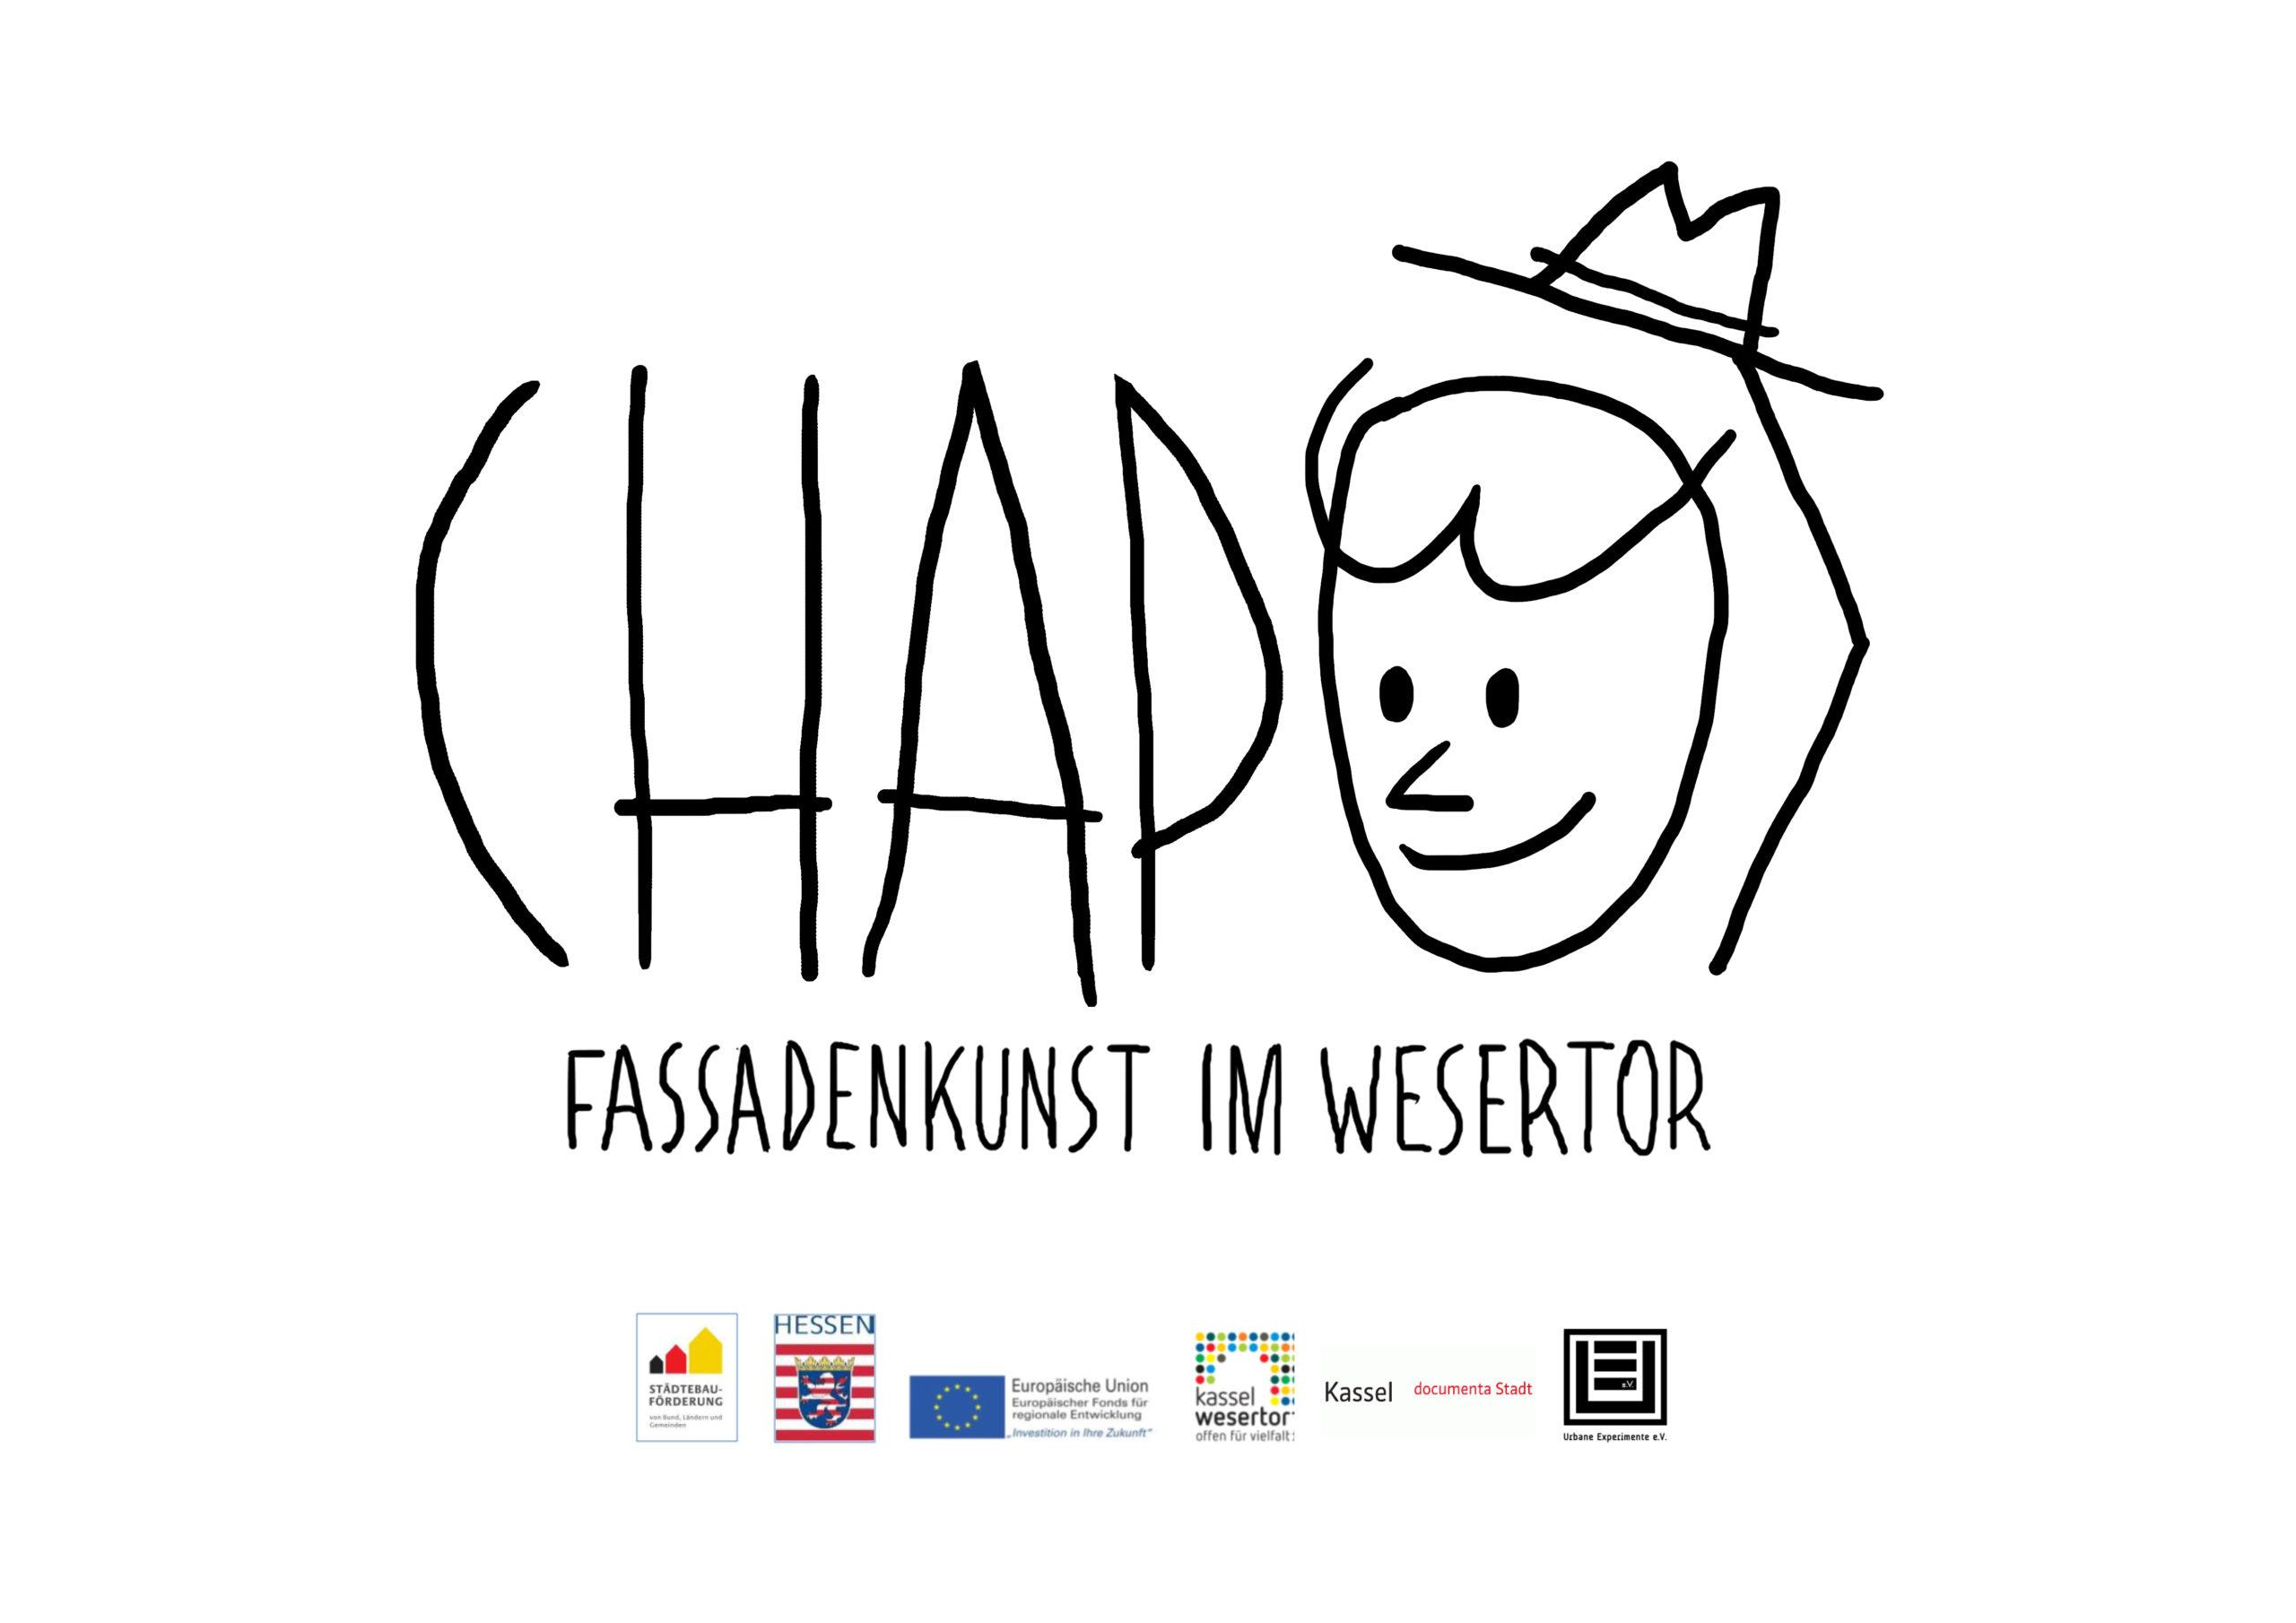 CHAPO – Fassadenkunst im Wesertor